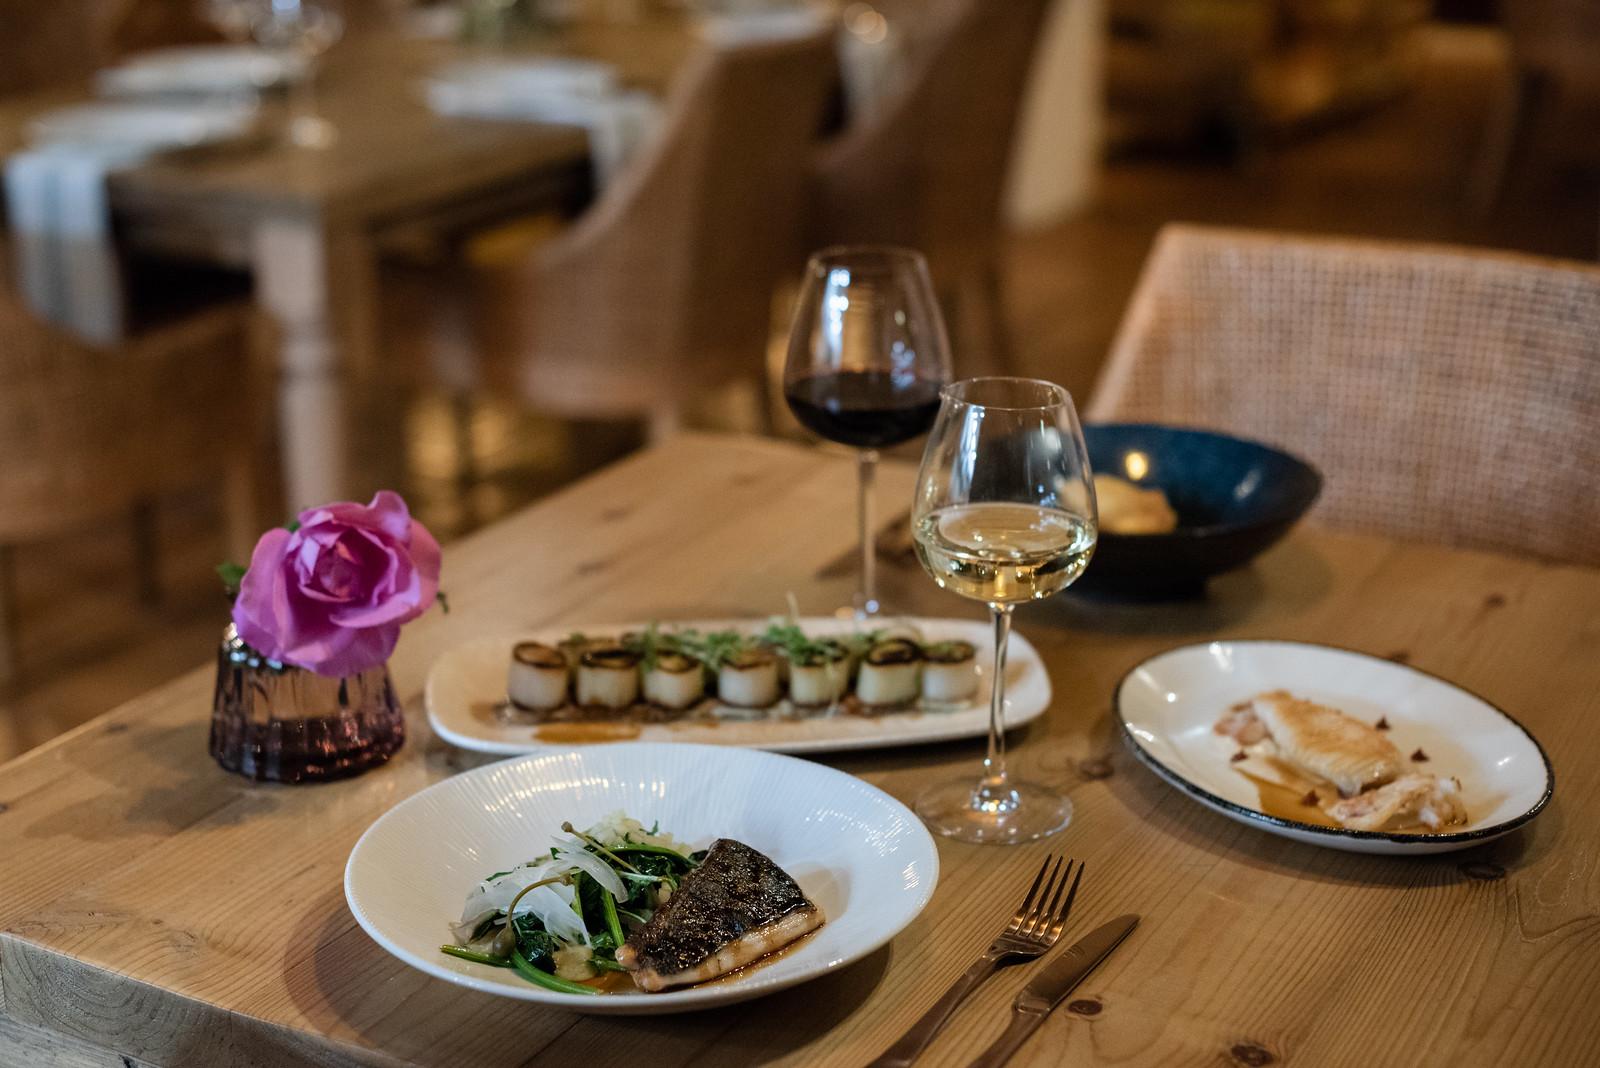 https://www.white-ibiza.com/wp-content/uploads/2020/11/cas-gasi-restaurant-2020-04.jpg